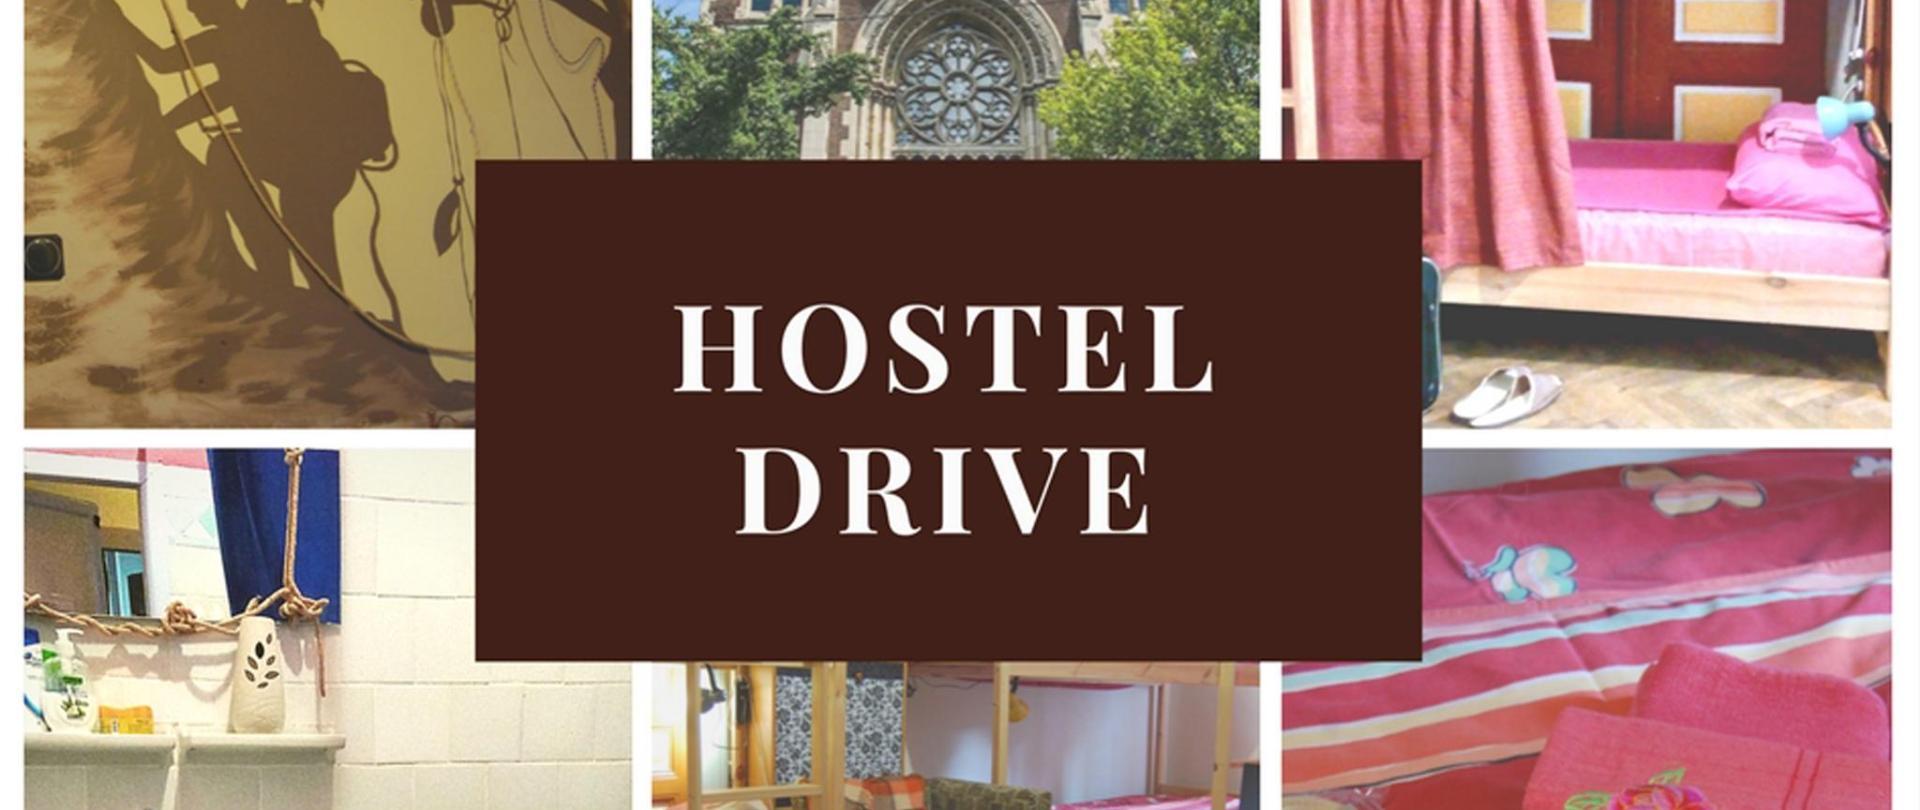 HostelDrive.jpg